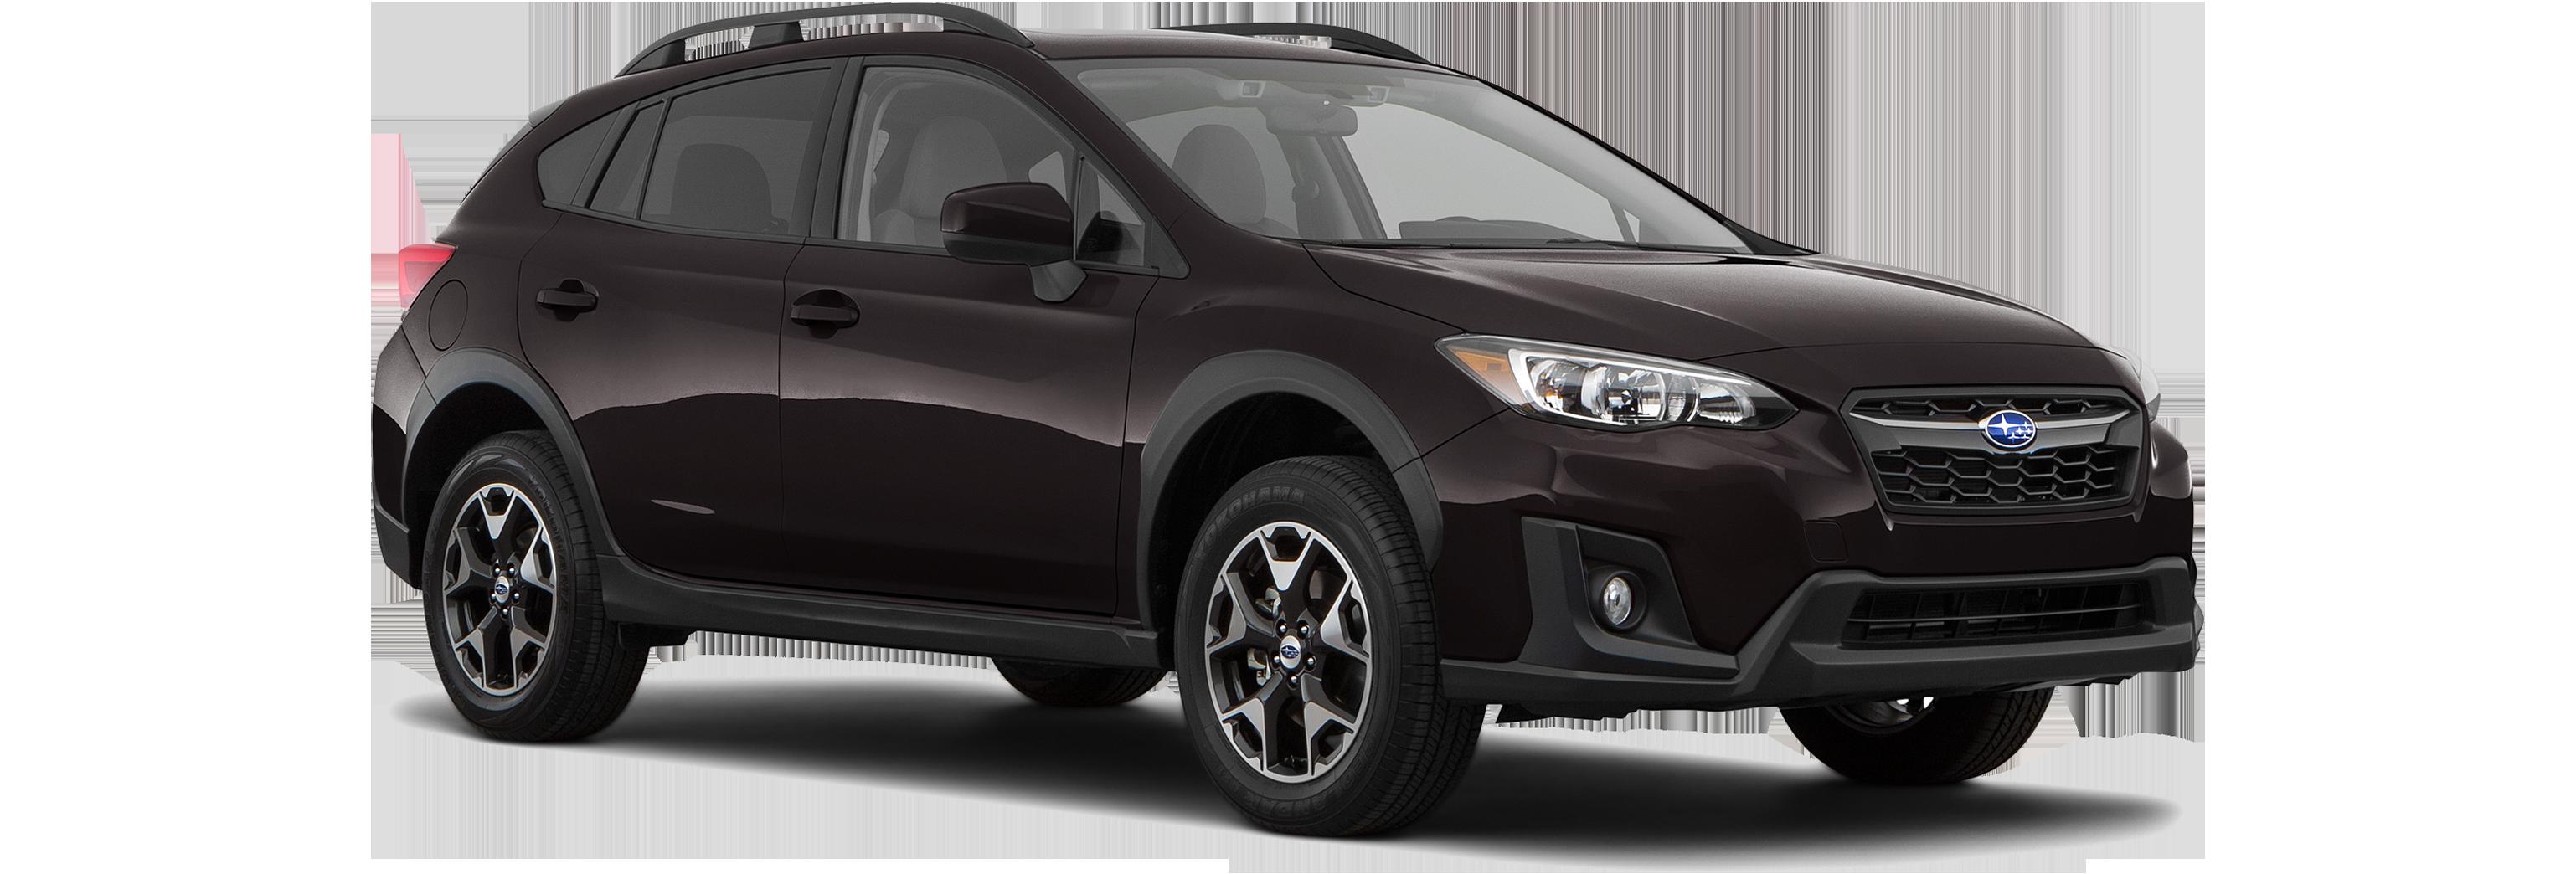 Walnut Creek Subaru >> 2019 Subaru Crosstrek Model Overview | Livermore, CA | Livermore Subaru